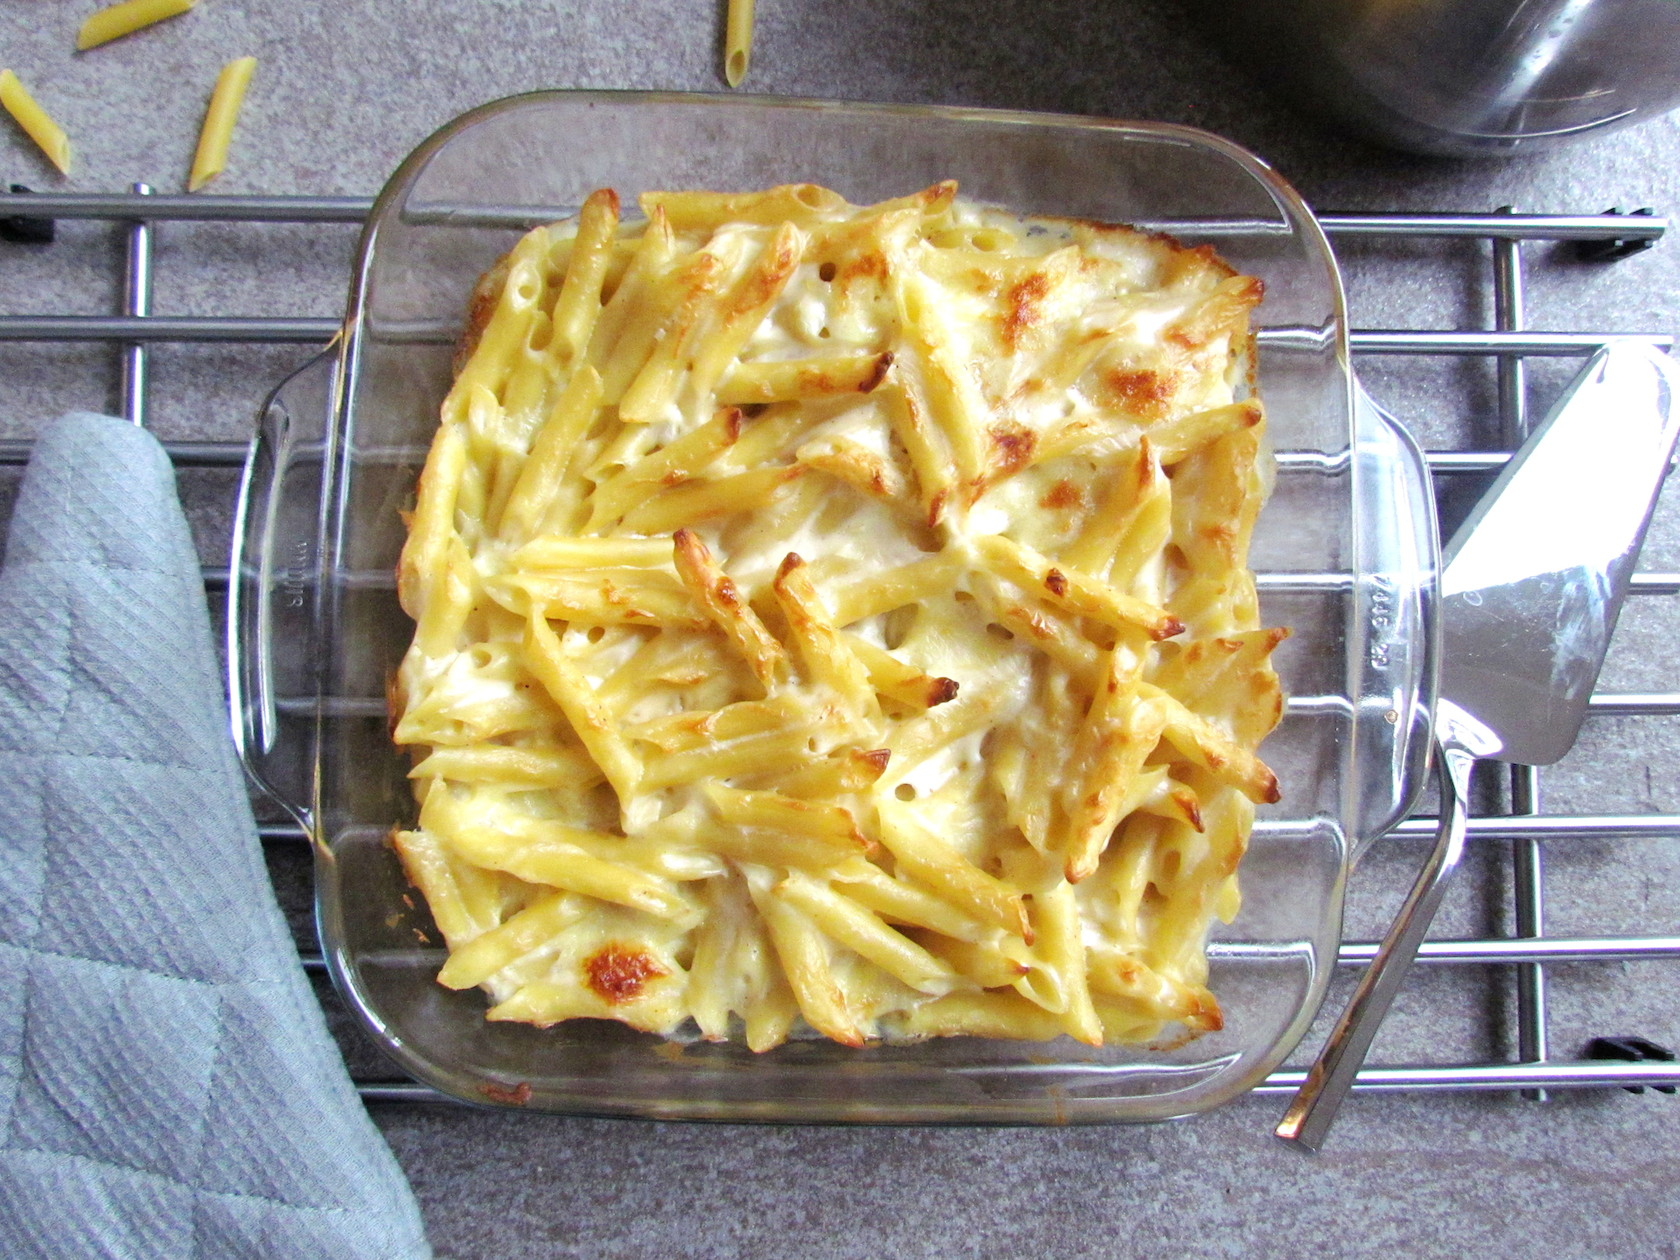 mozzarella pasta bake | www.savormania.com